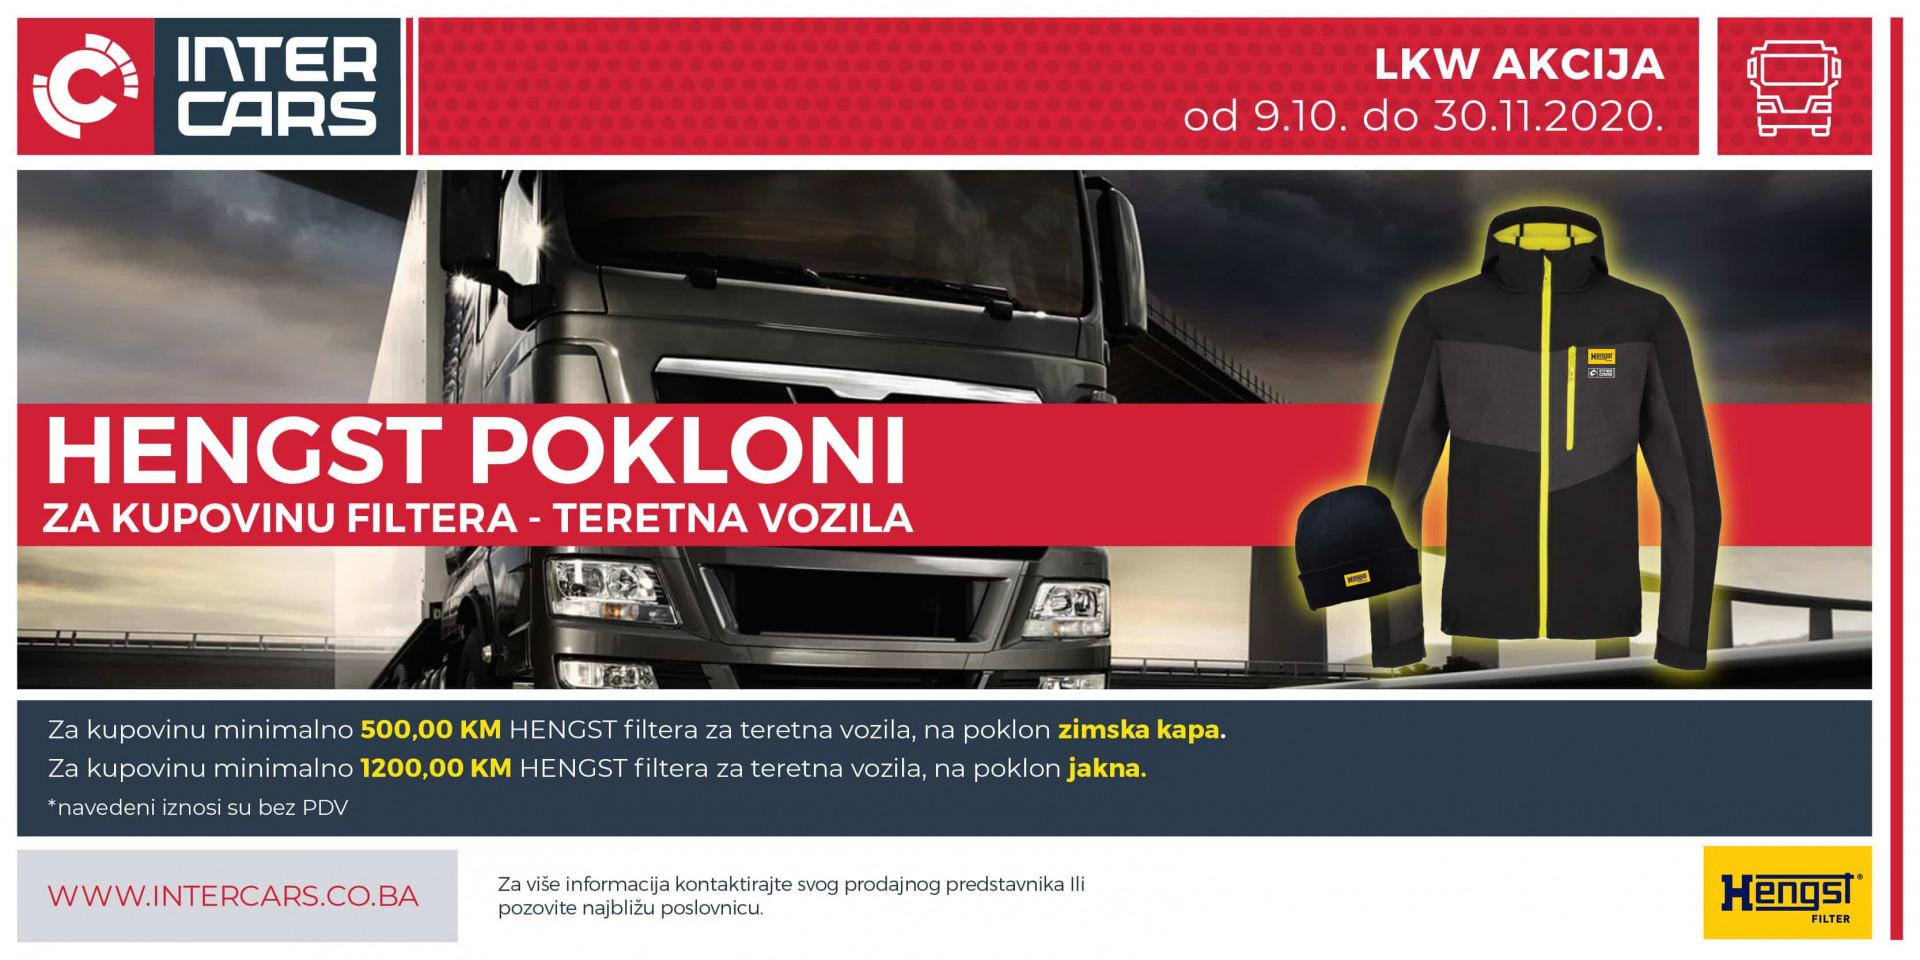 Hengst LKW letak 800x400 akcija filteri intercars inter cars.jpg